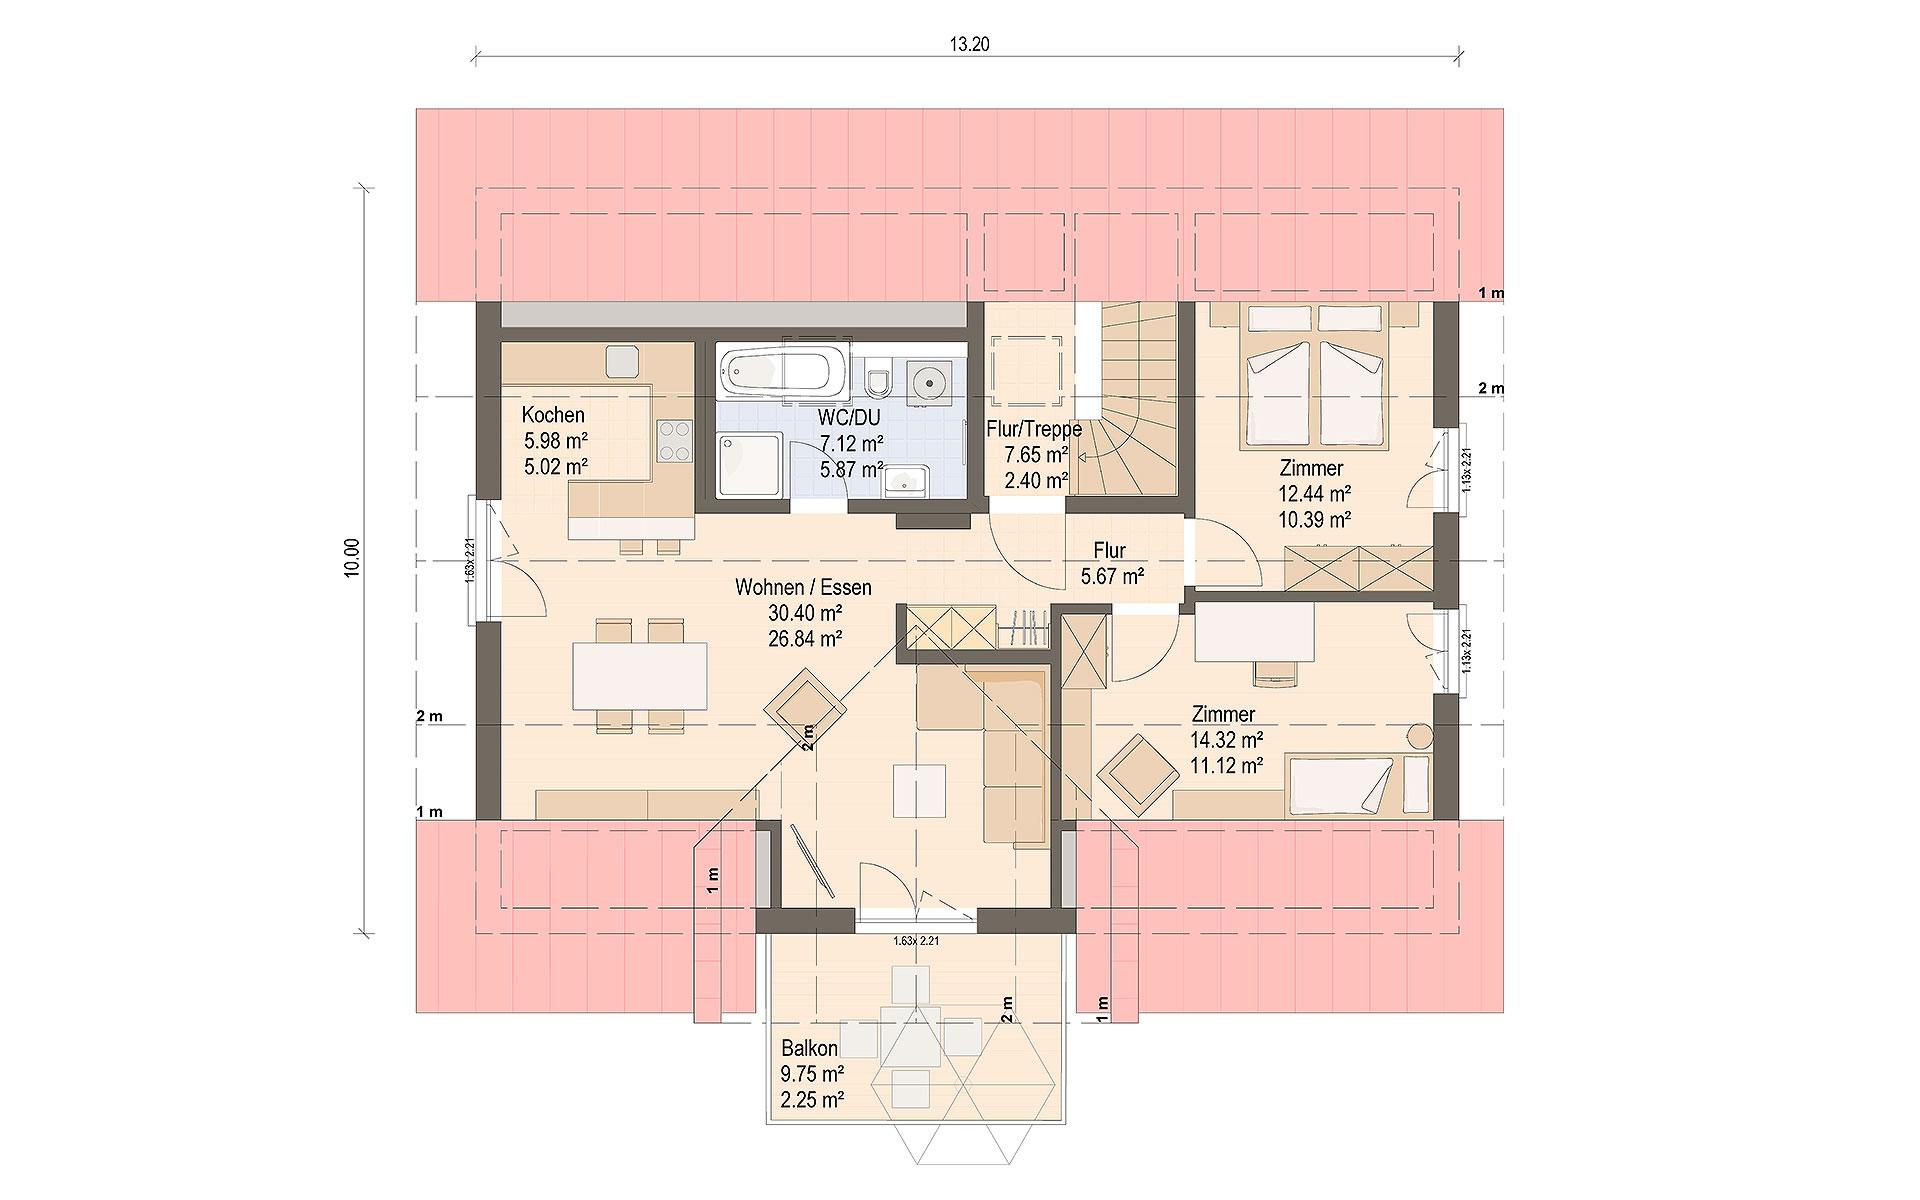 Dachgeschoss Haas WOB 3 B von Haas Fertigbau GmbH